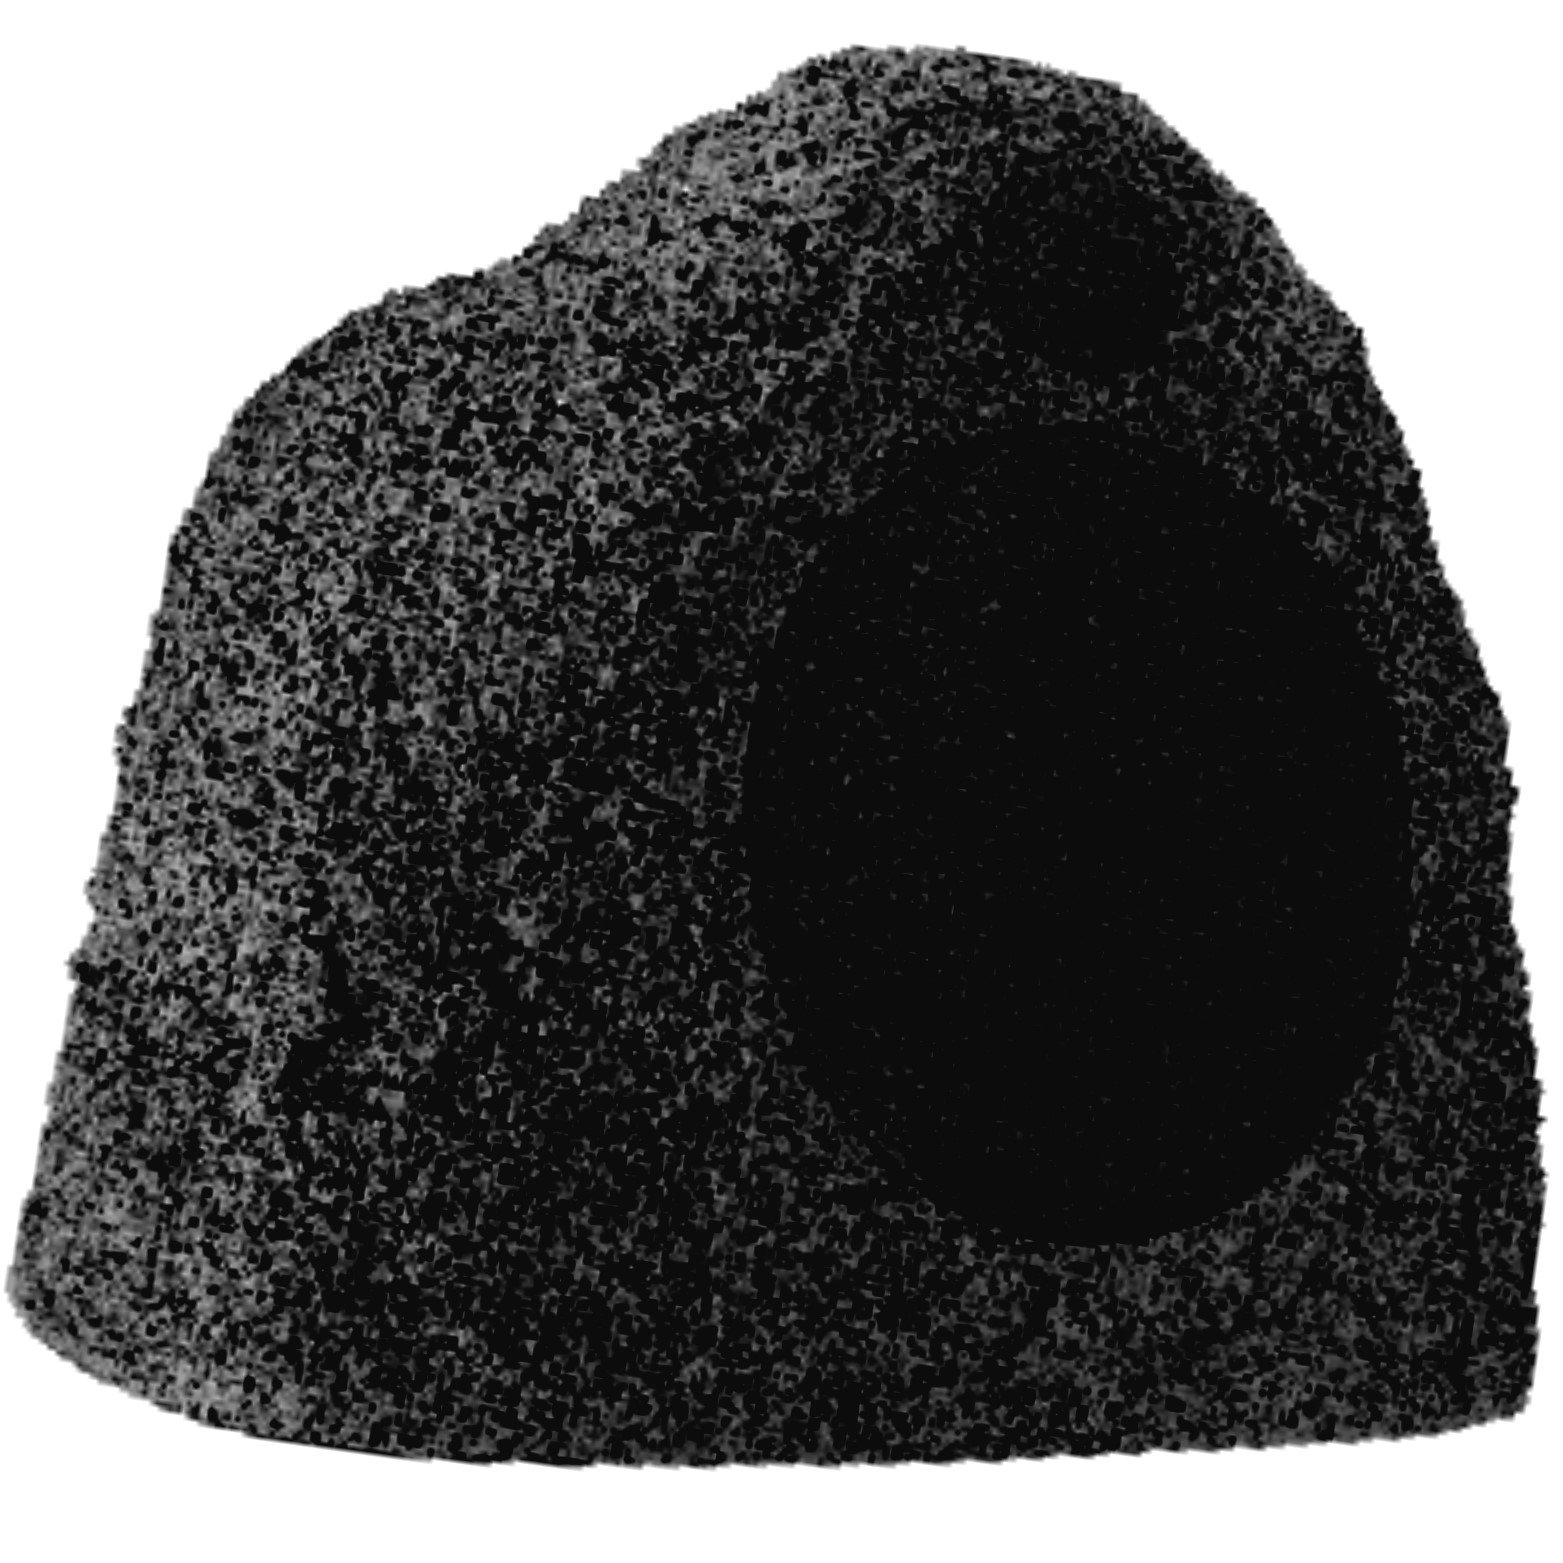 Stereostone Cinema Rock Outdoor Speaker 8 Inch Davinci Rock Speaker (Black Lava) by Stereostone